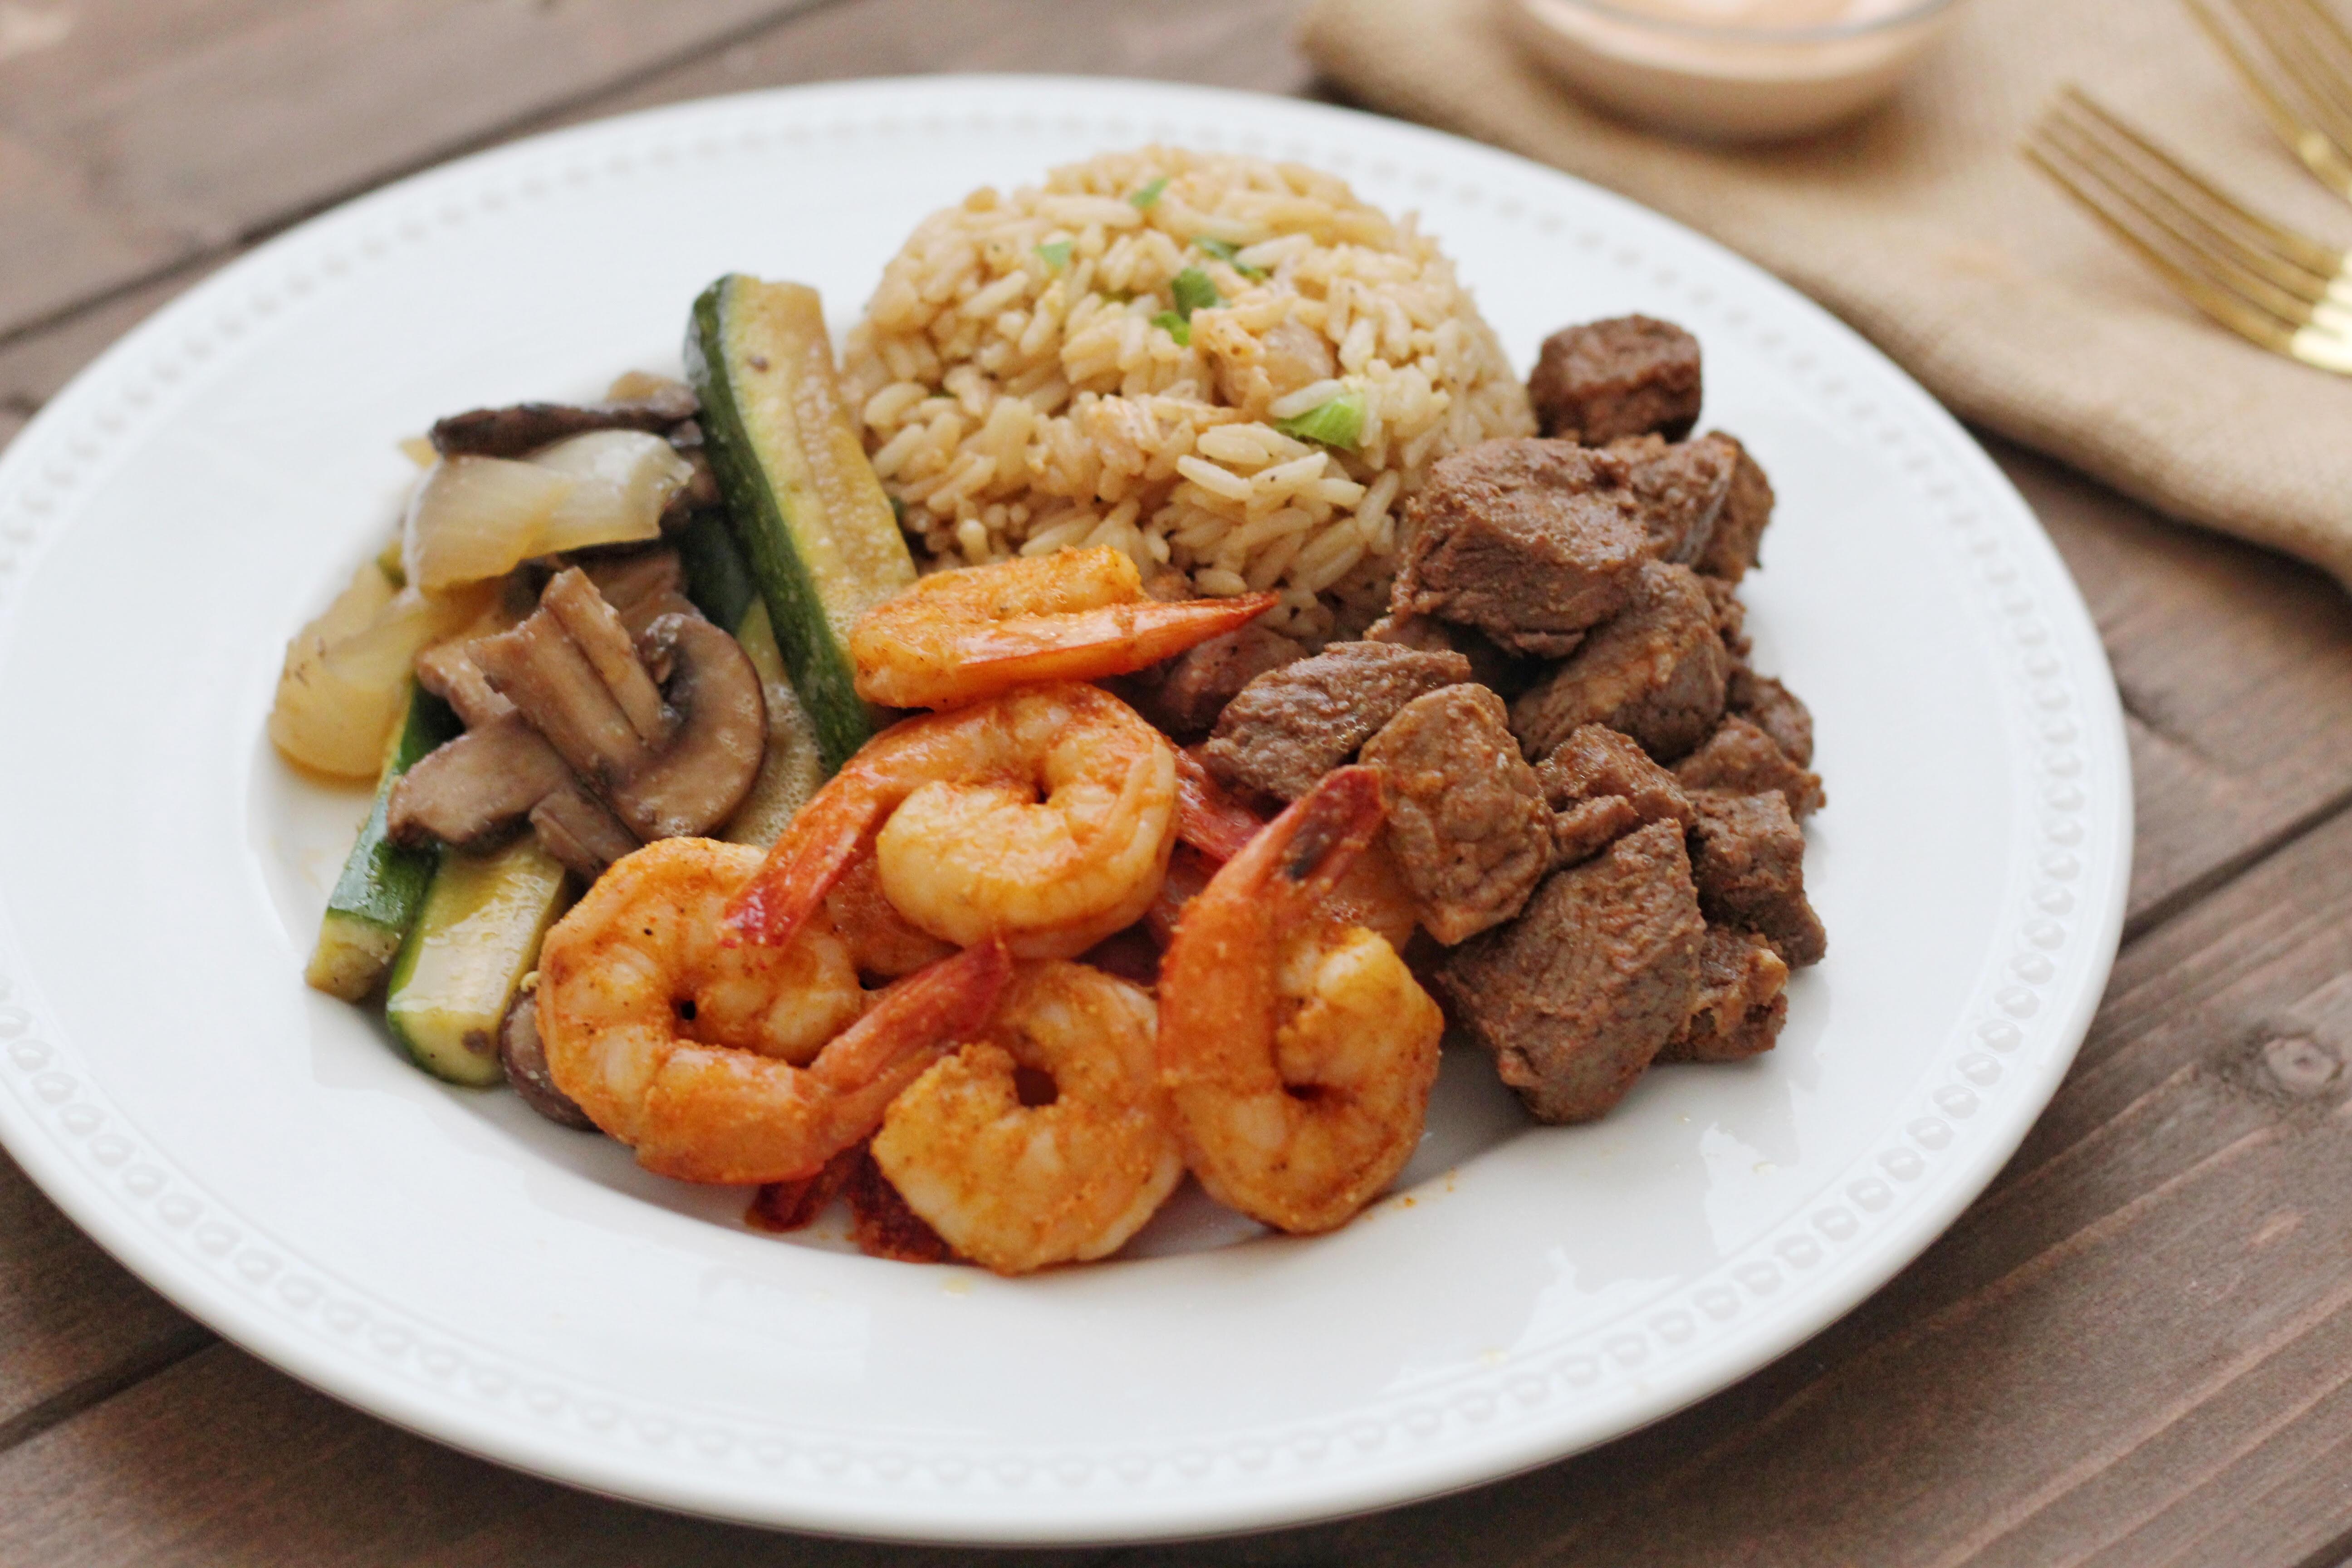 Hibachi Shrimp and Steak